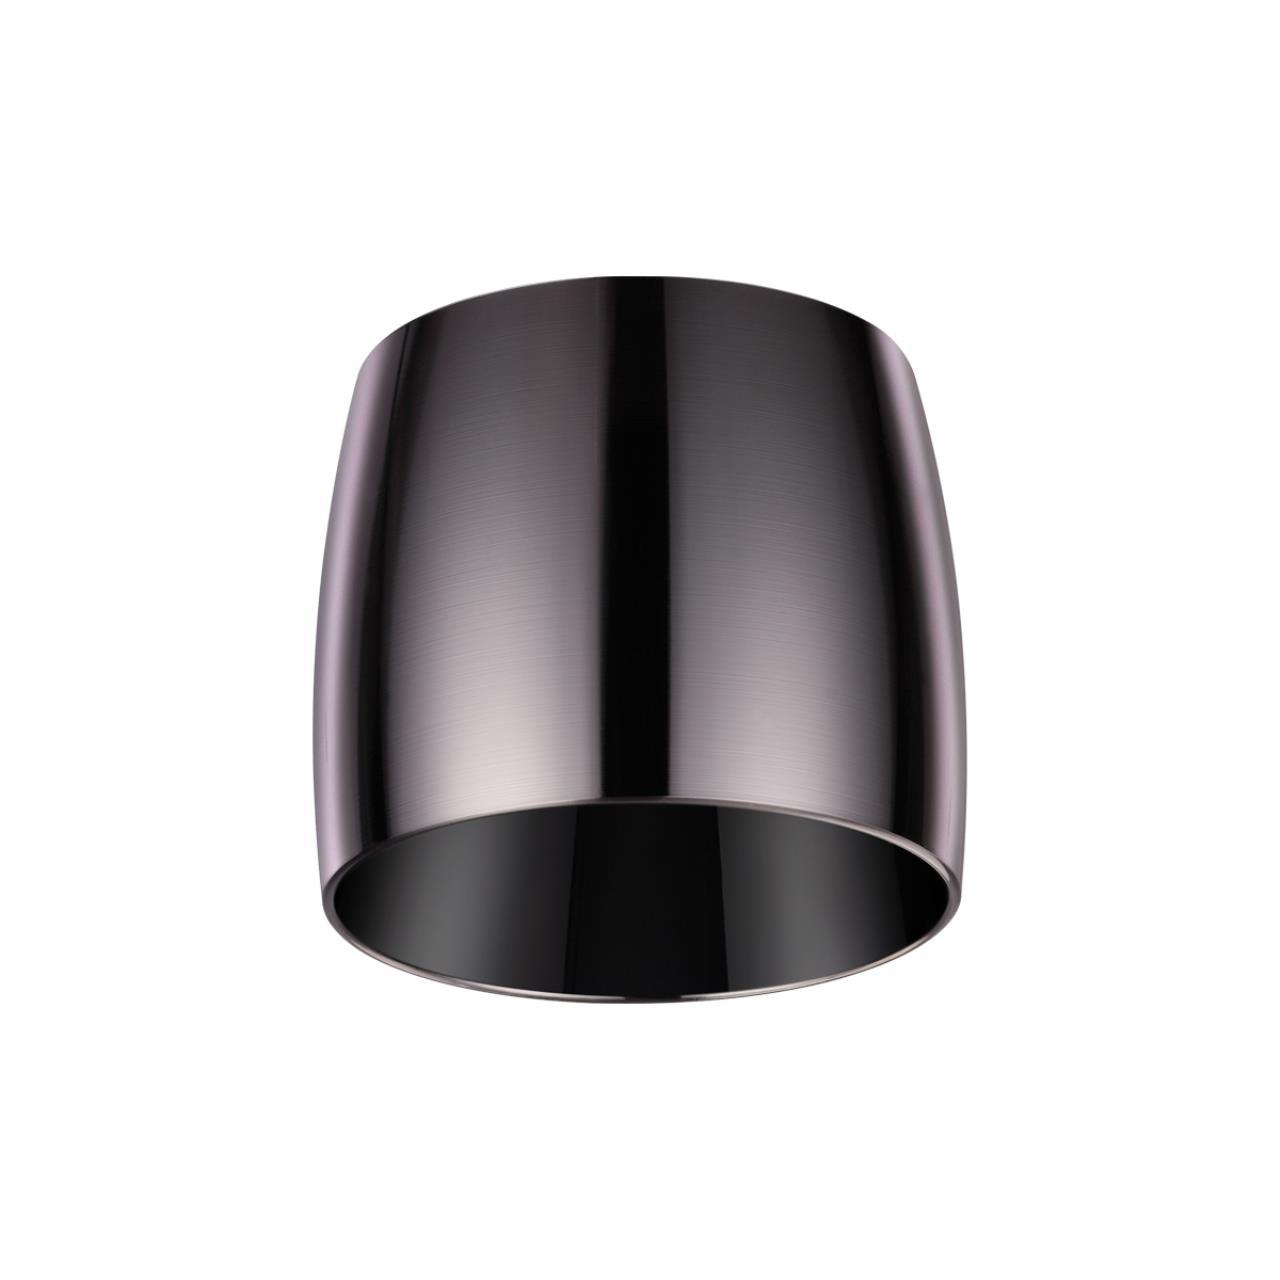 370612 KONST NT19 030 жемч. черный Плафон к арт. 370605, 370606, 370607, 370608 IP20 220V UNIT